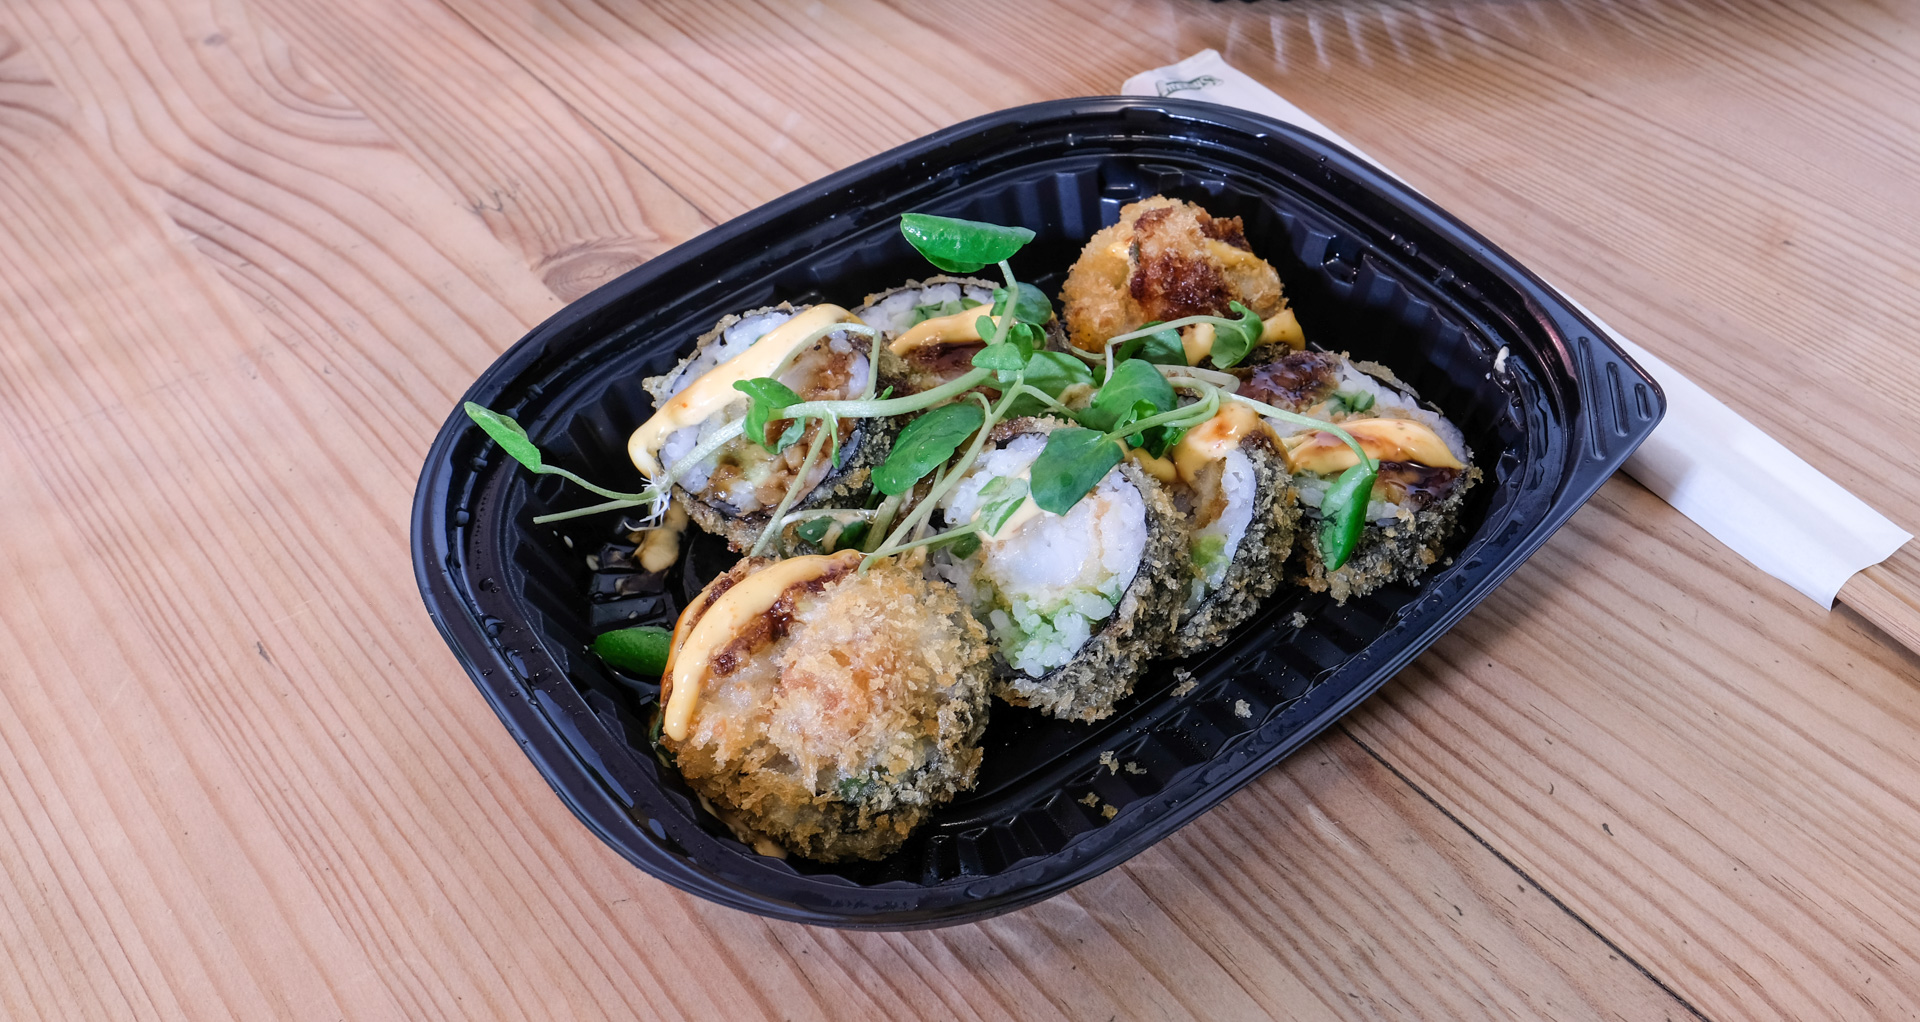 Madanmeldelse: Sushi fra Nori Bar overraskede på flere områder